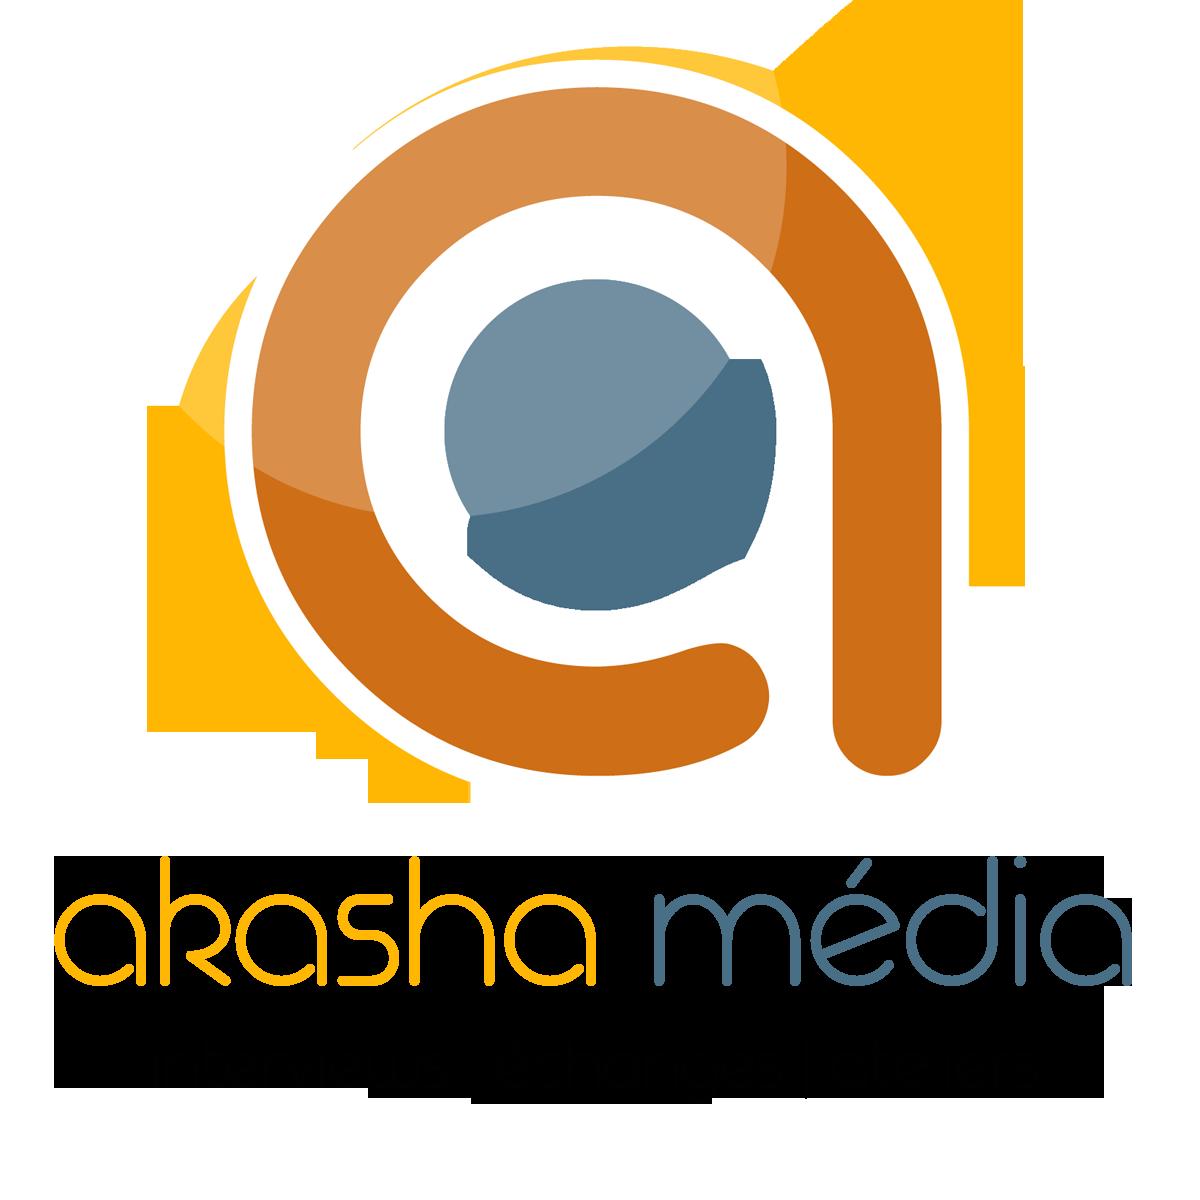 Akasha media